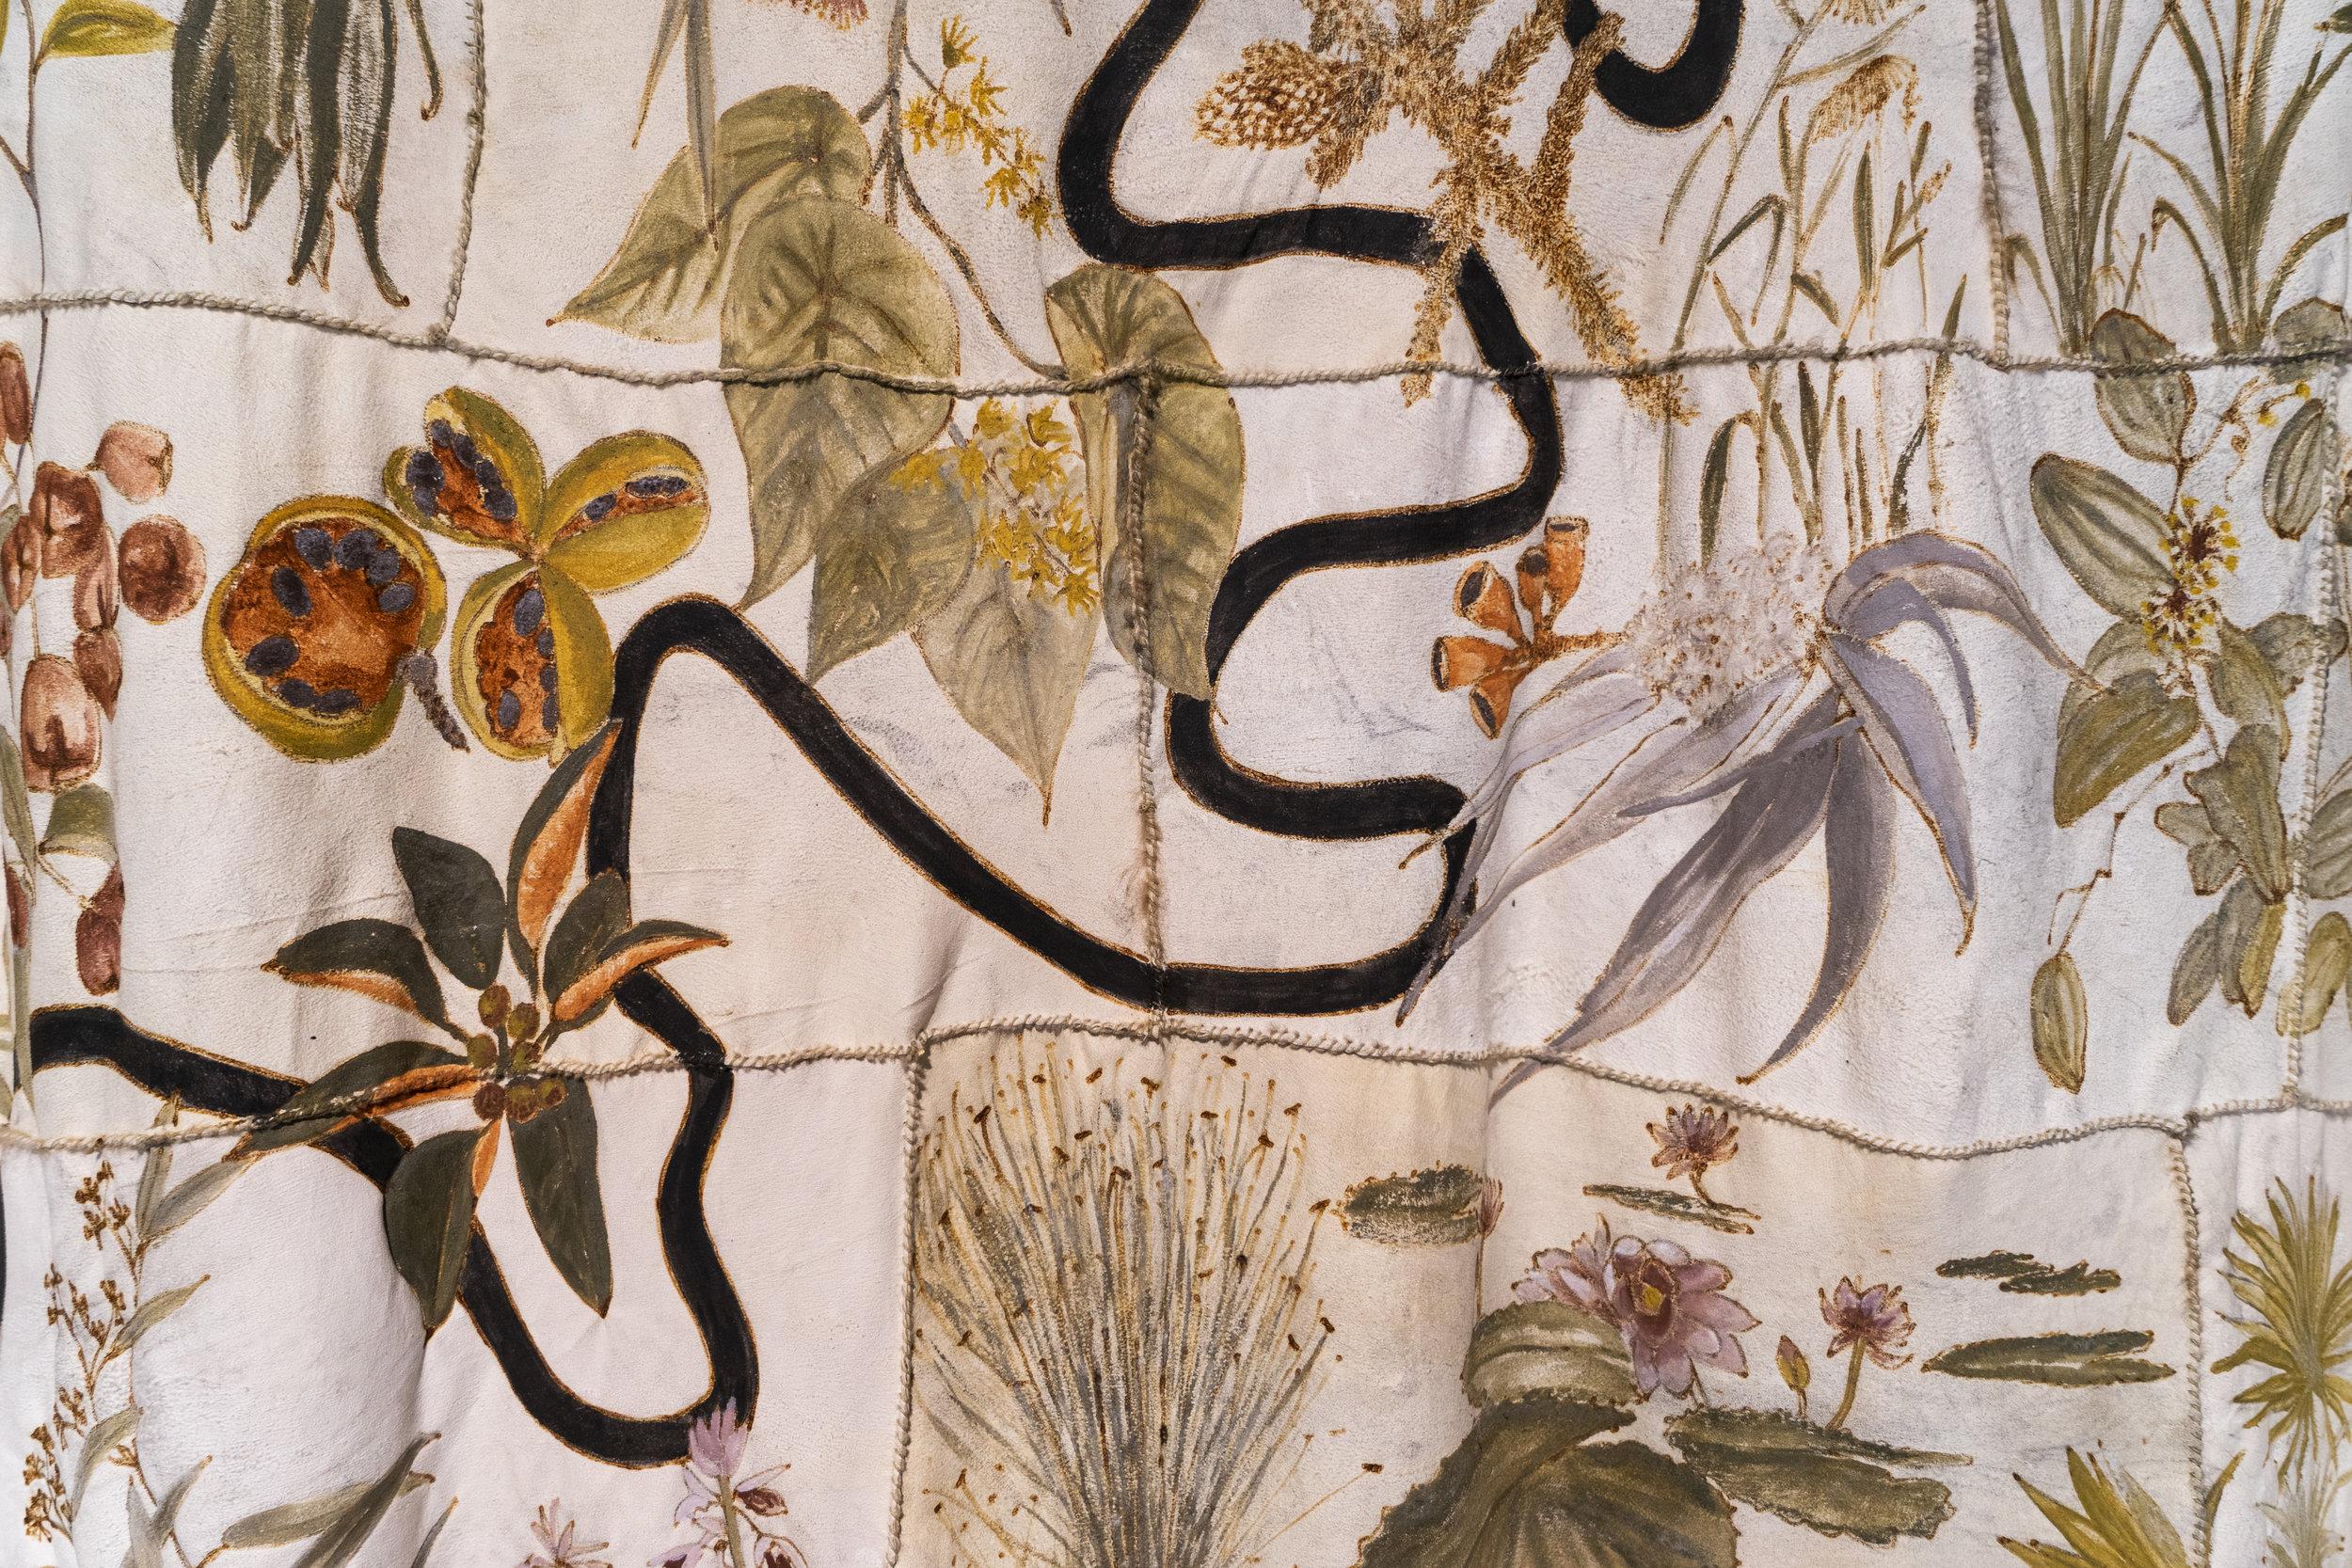 Carol McGreggor, Skin Country (detail), 2018, possum skins, charcoal, ochre, binder medium, waxed thread. Photo: Louis Lim